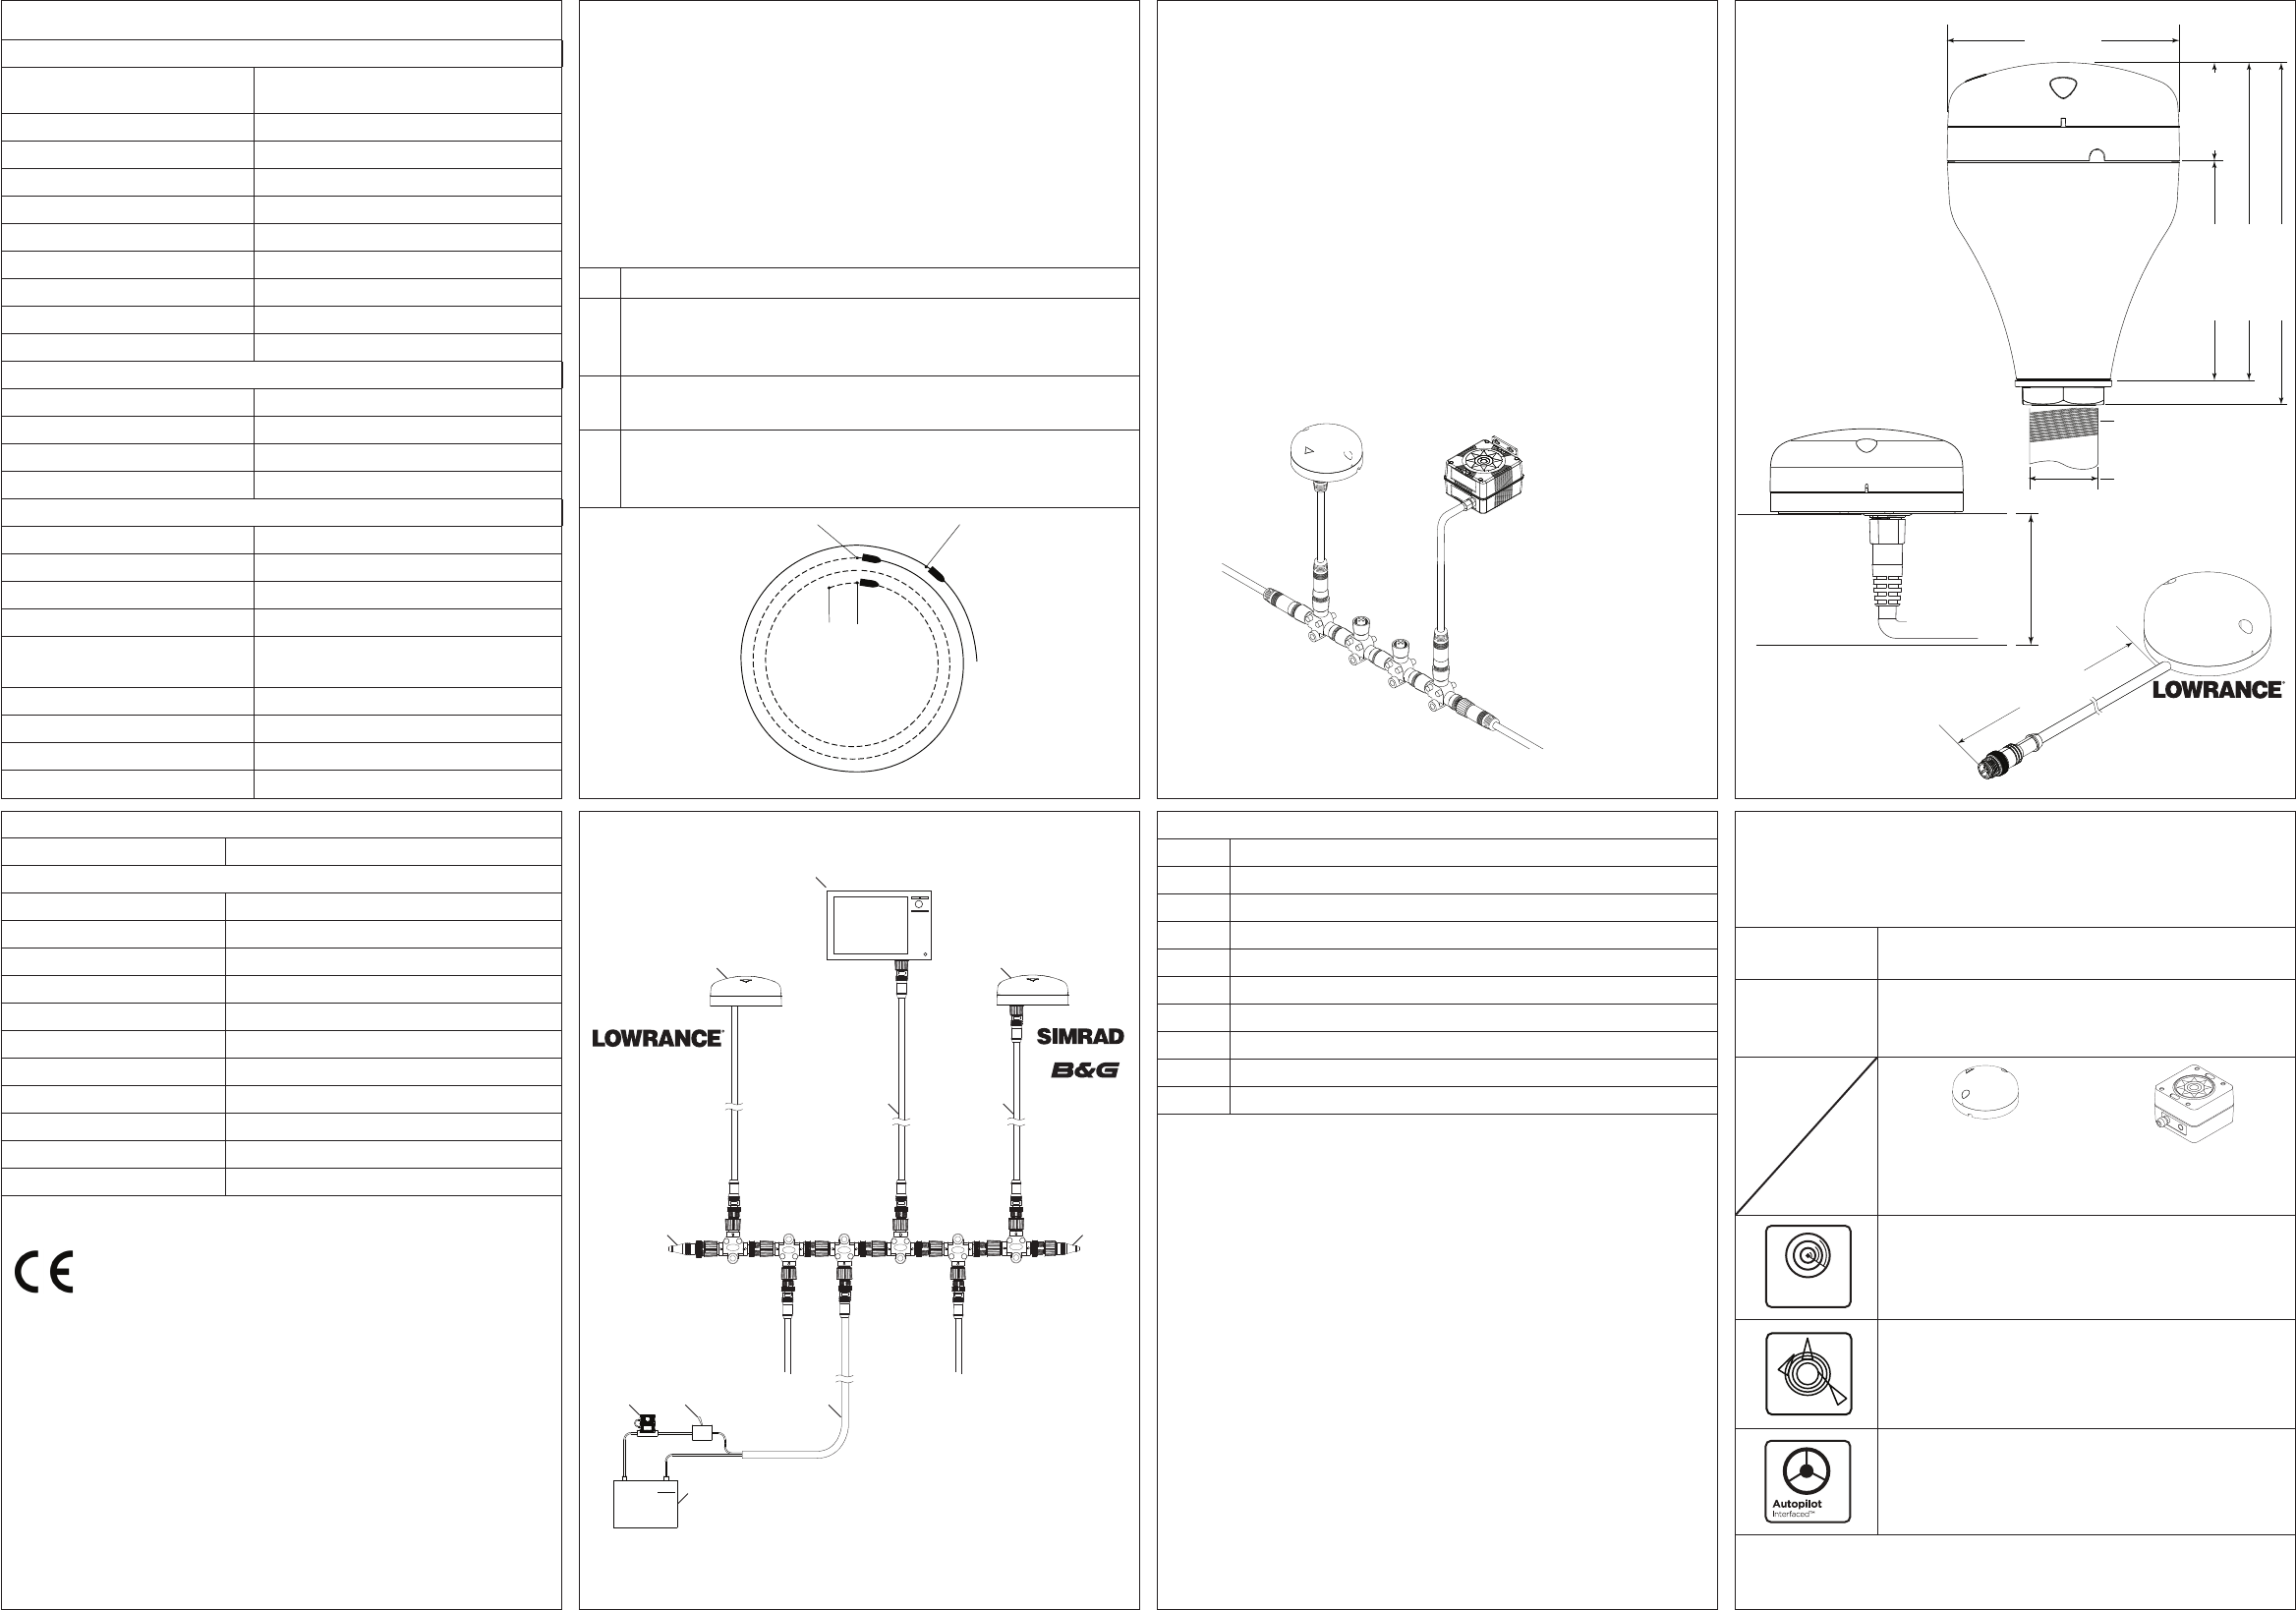 Handleiding Lowrance Gps Antenna Pagina 2 Van English Nmea Cable Wiring Diagram 38 Mm 150